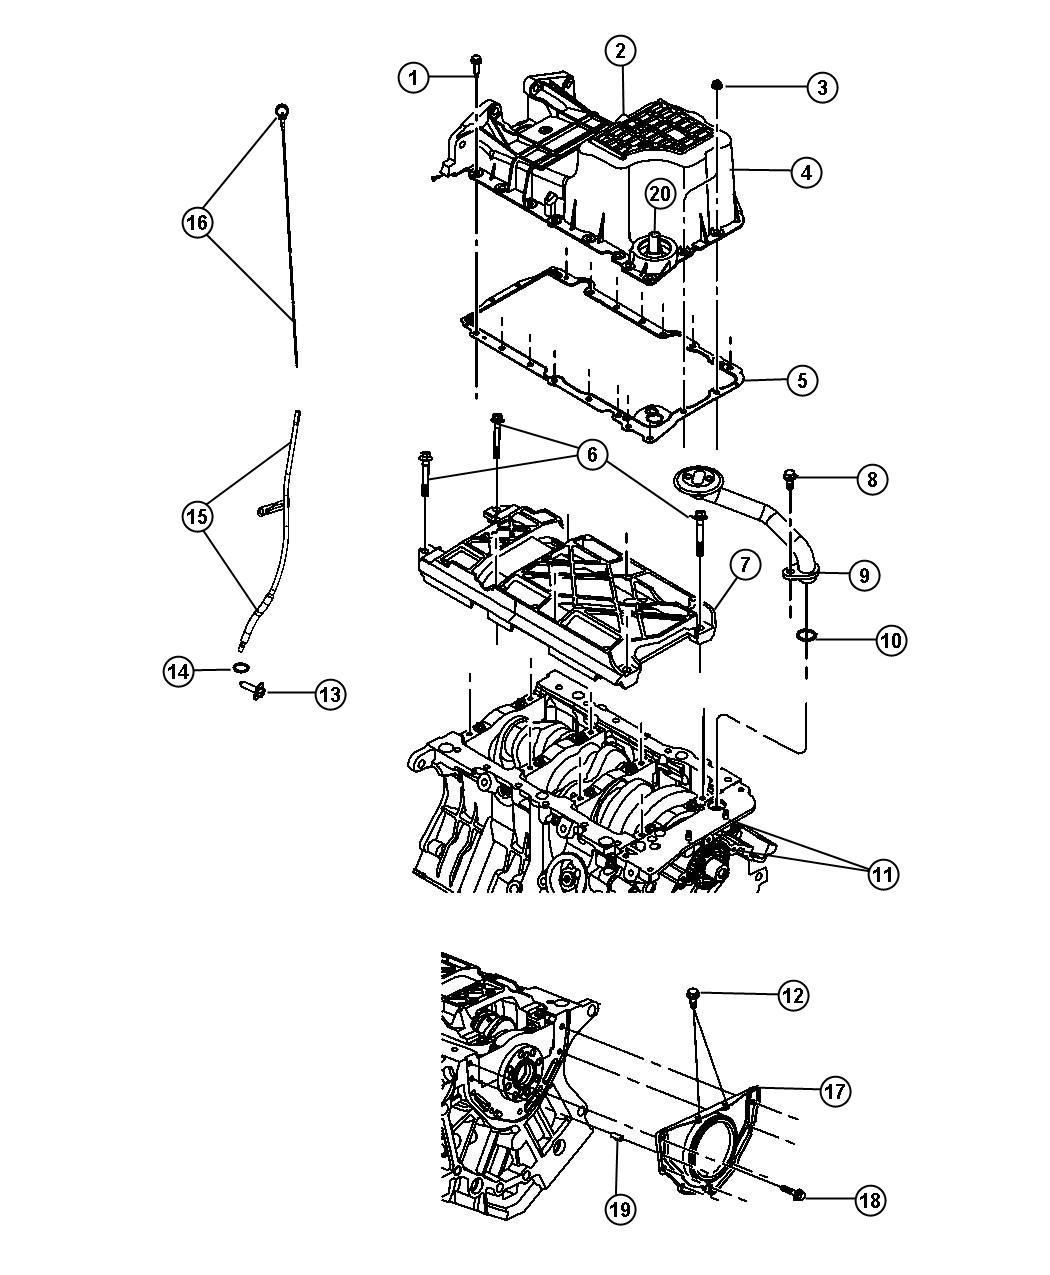 Chrysler 300 Pan Oil All Wheel Drive Engine